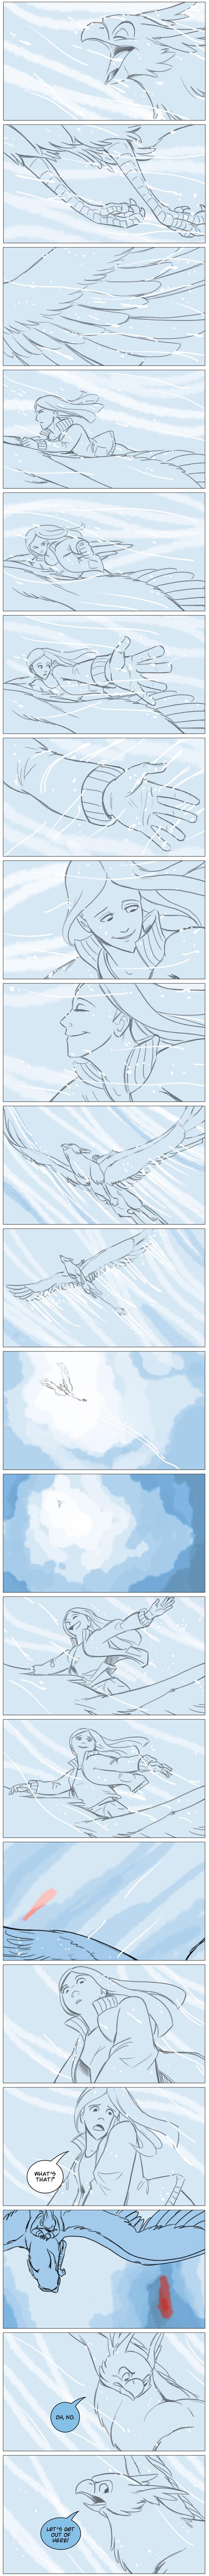 Arc 1 - 58